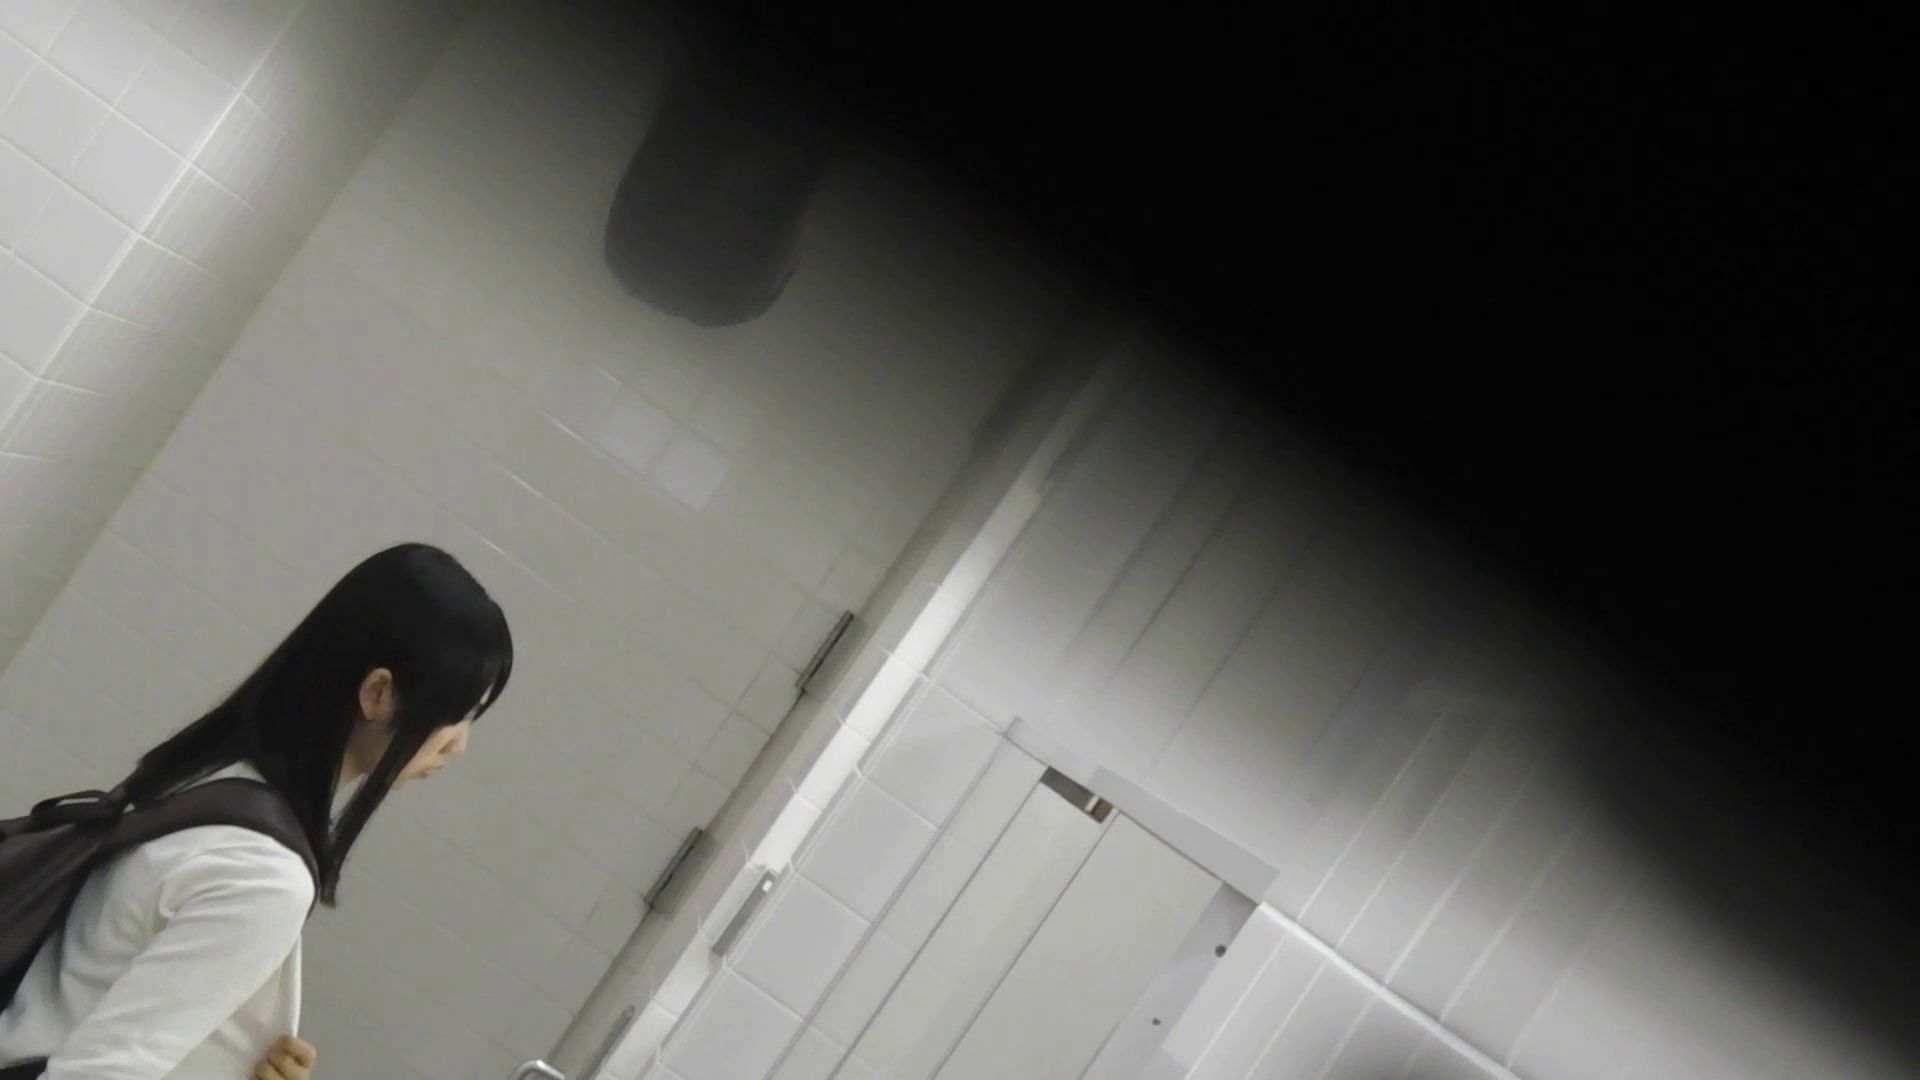 vol.21 命がけ潜伏洗面所! ナイスな和式バックショット 洗面所 AV無料 76連発 71